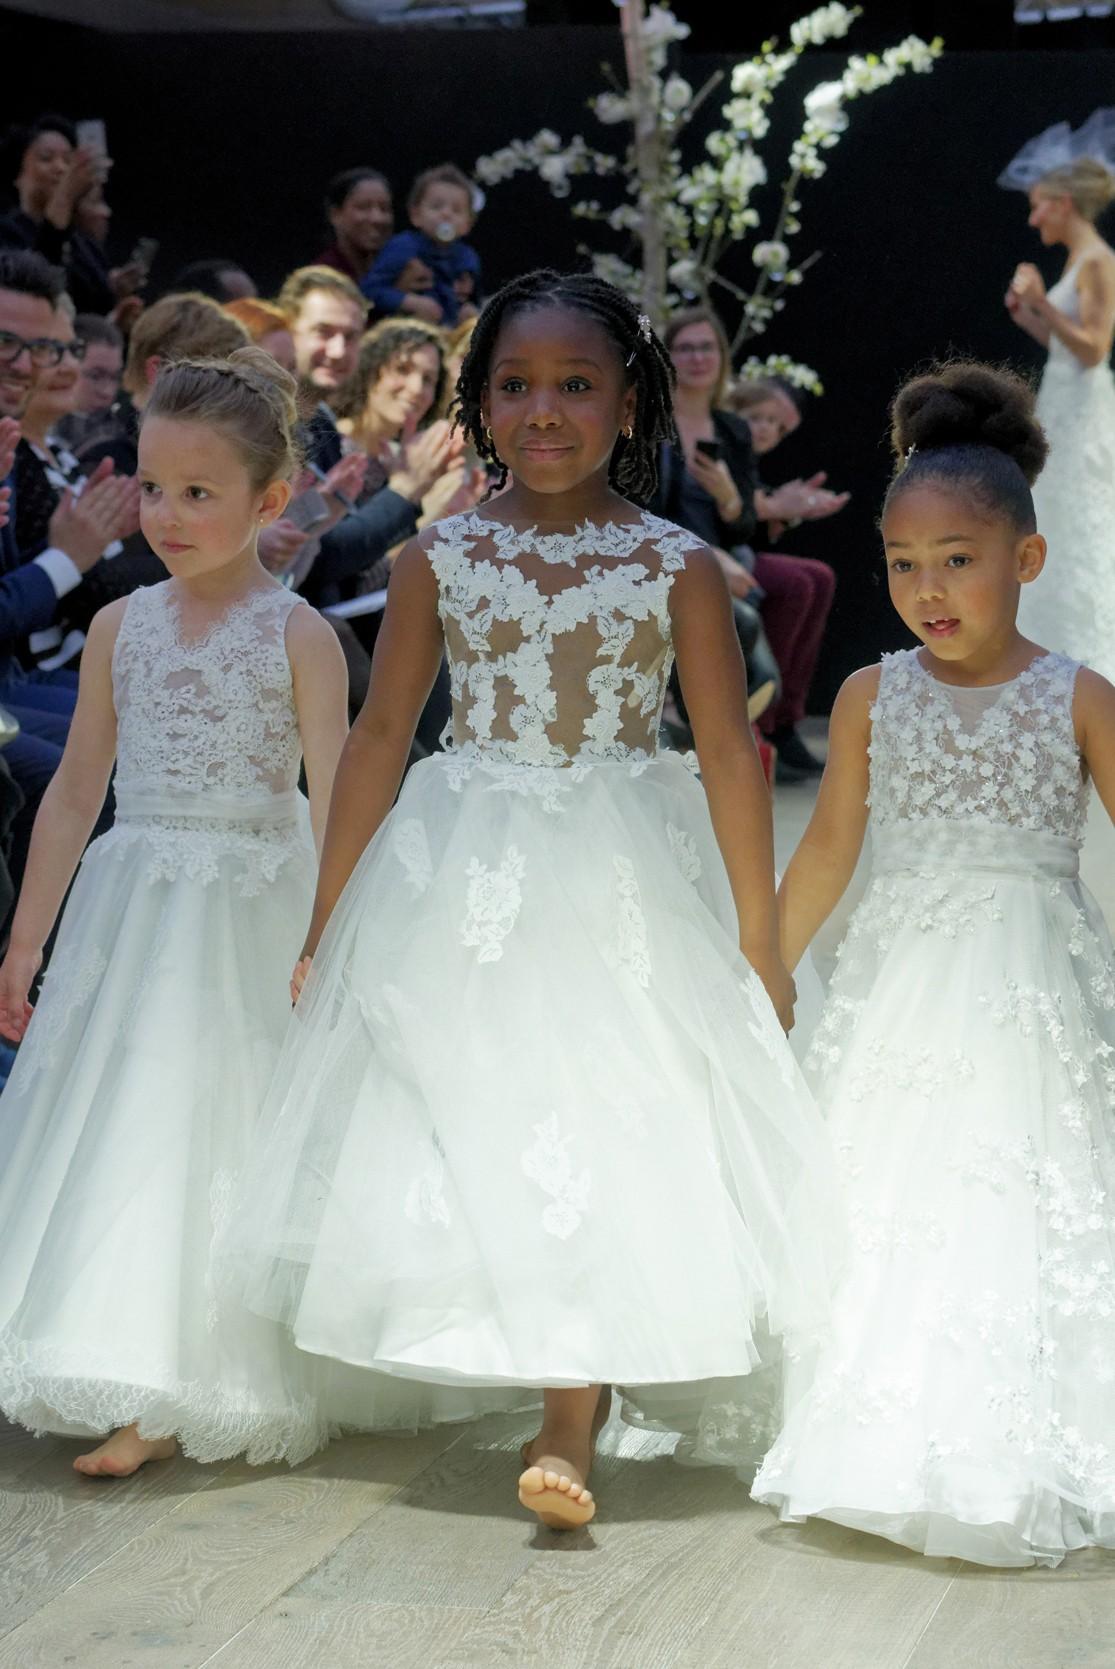 Robe mariage enfant - Robe de ceremonie fille - Robe cortege enfant Cymbeline